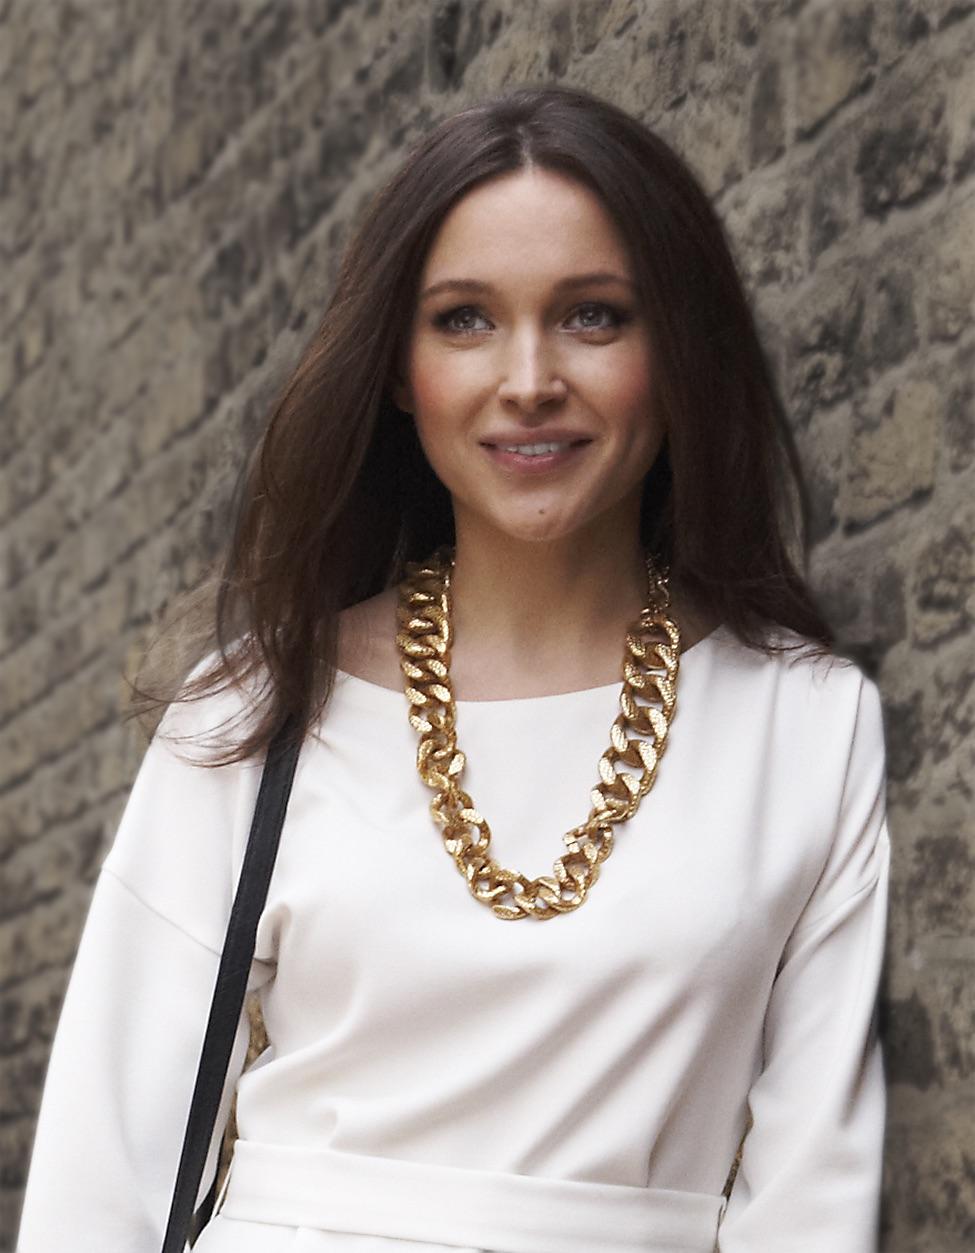 Francesca Hornak - Caroline Bender in The Best Of Everything by Rona Jaffe